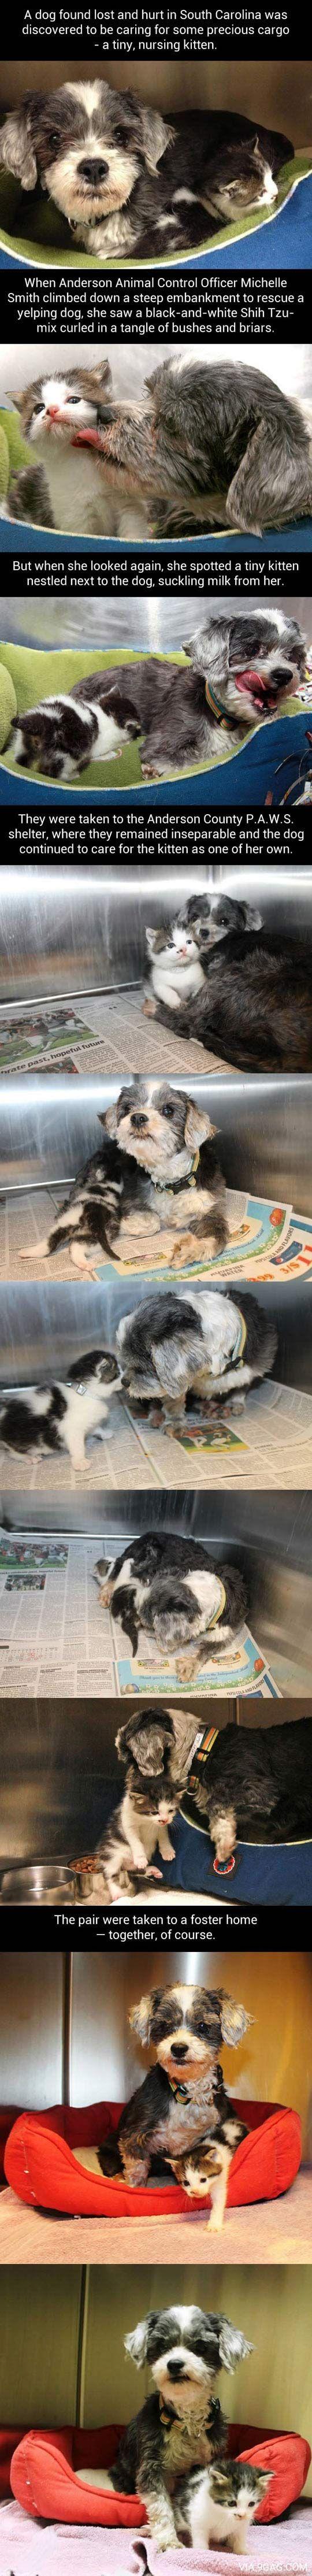 Rescued dog rescued kitten